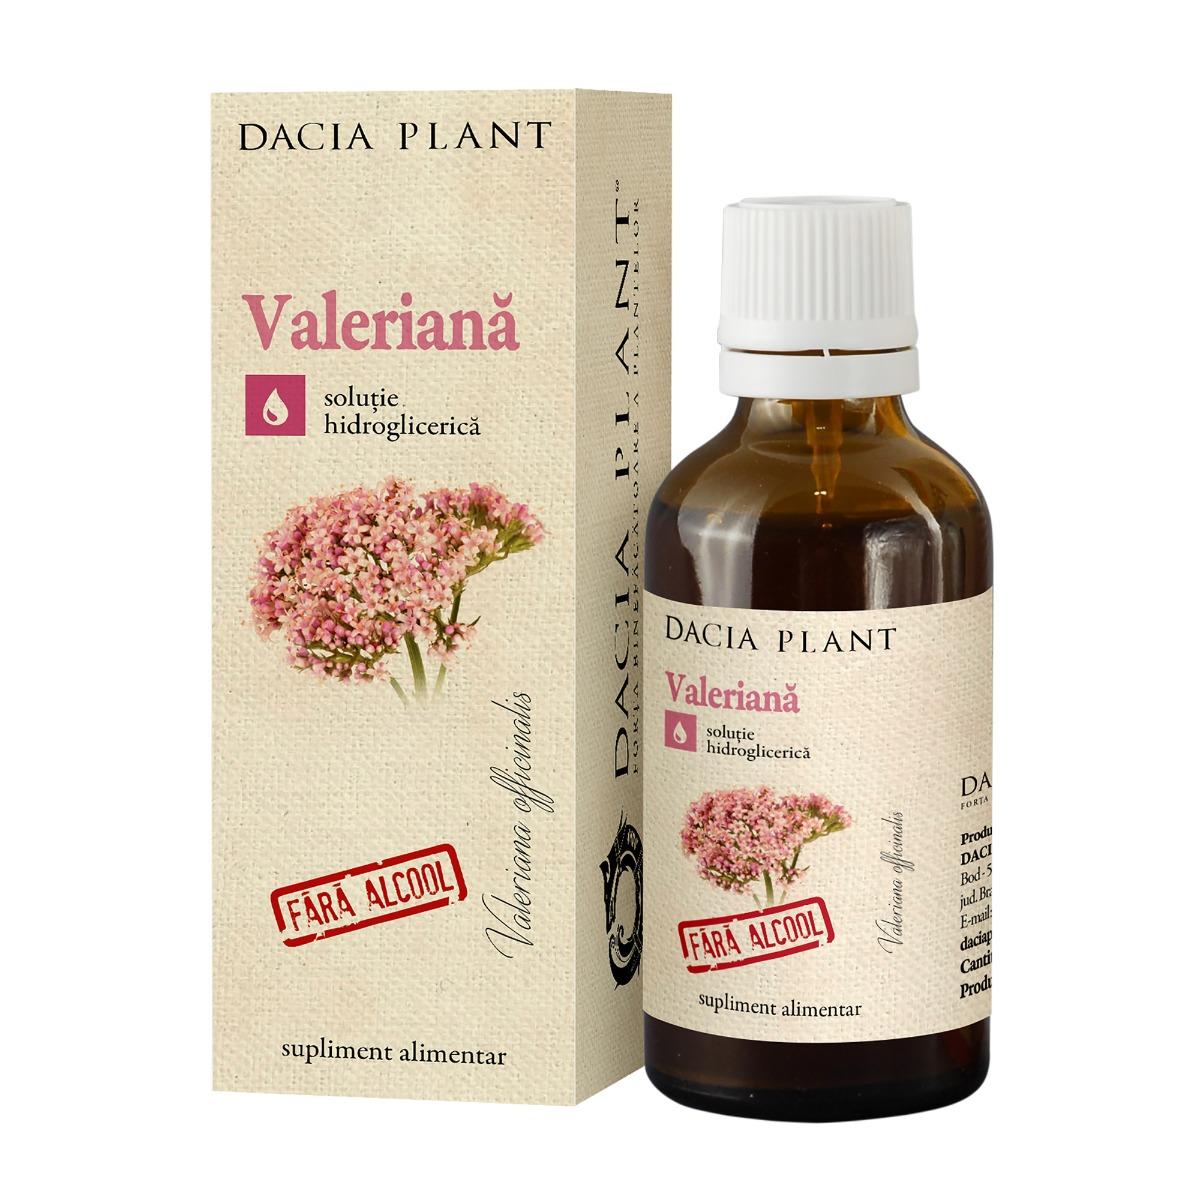 Tinctura de valeriana fara alcool, 50ml, Dacia Plant drmax.ro